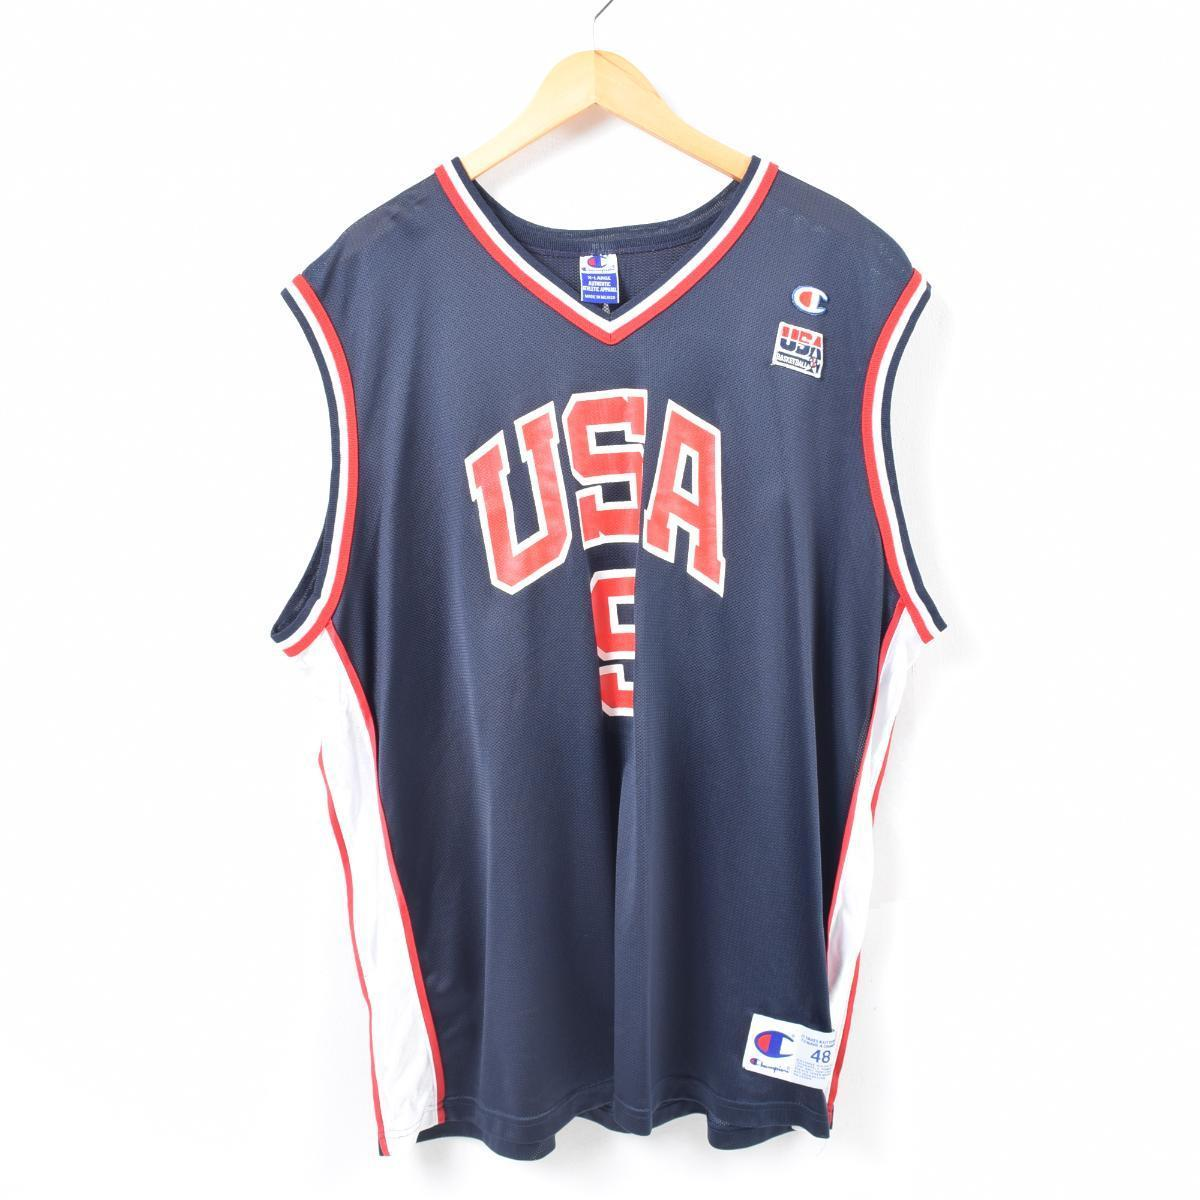 big sale 1ac4c ac8c0 90s champion Champion USA BASKETBALL Vince Carter Vince Carter game shirt  replica uniform men XXL /was2499